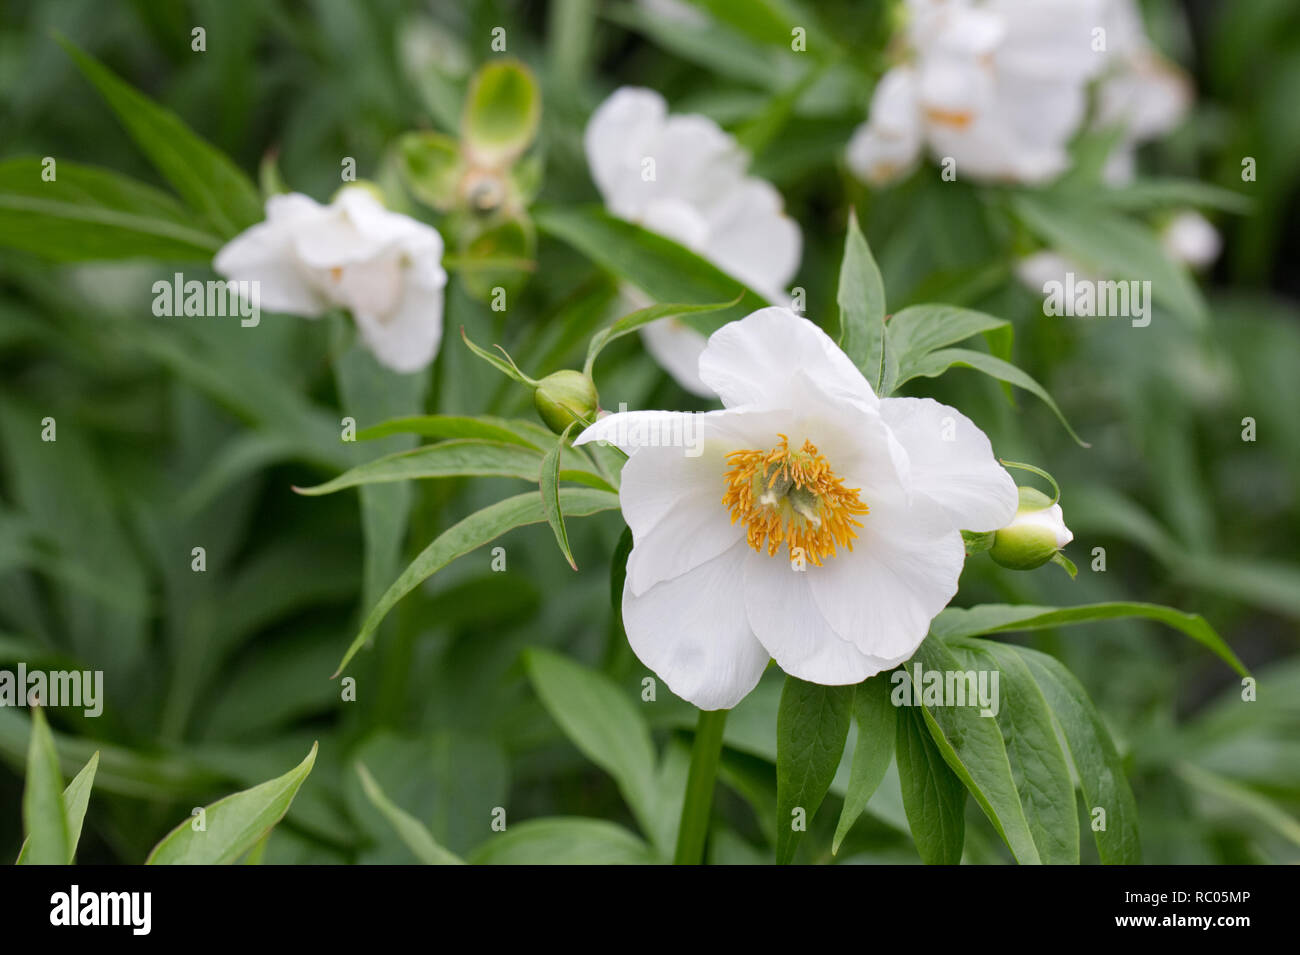 Paeonia emodi flowers in Spring. Stock Photo